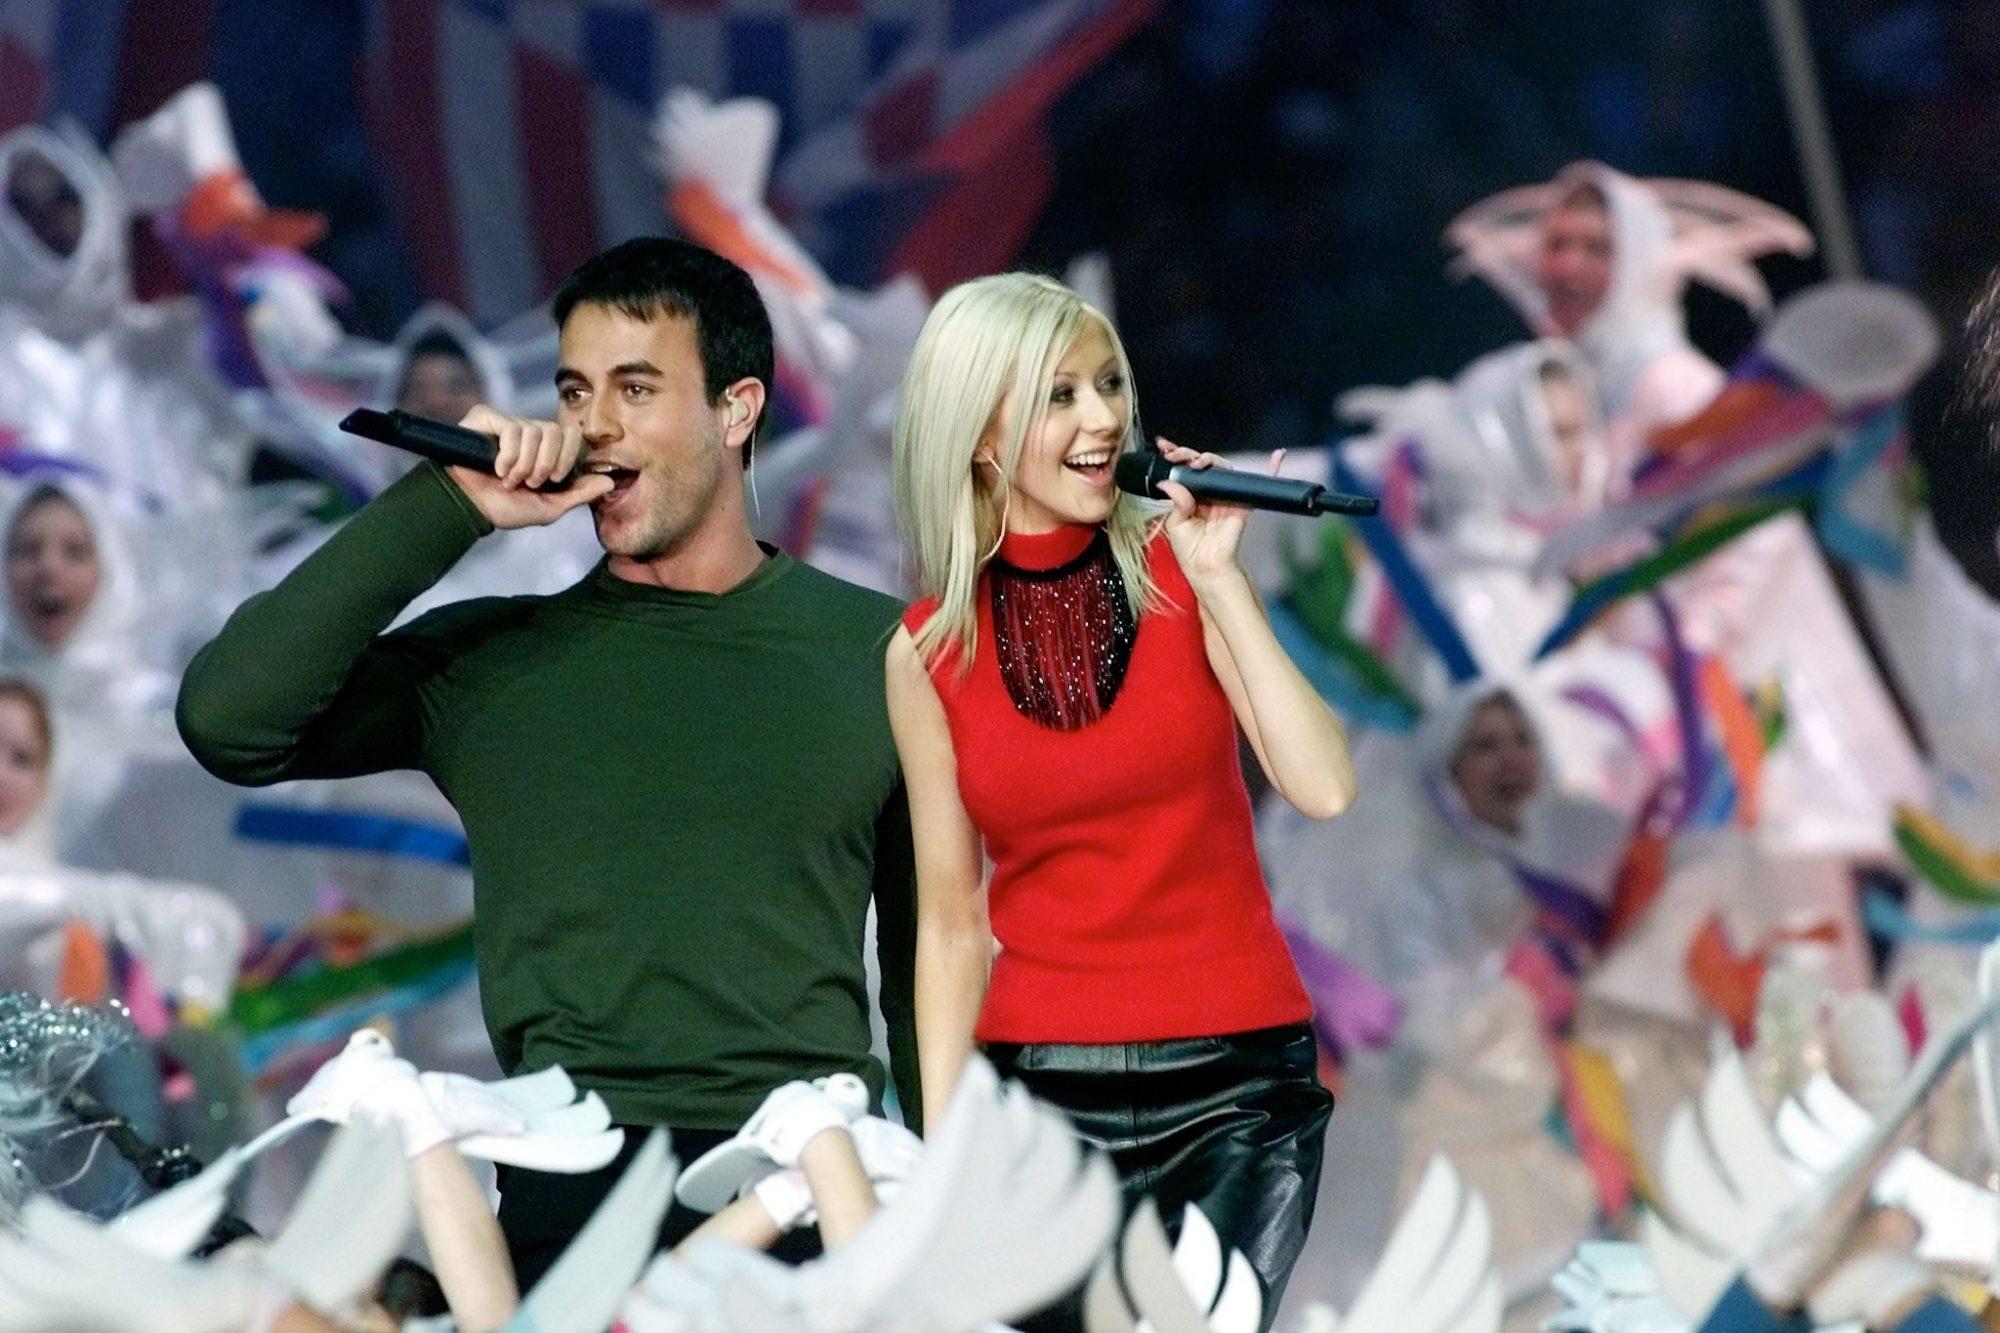 Christina Aguilera, Enrique Iglesias